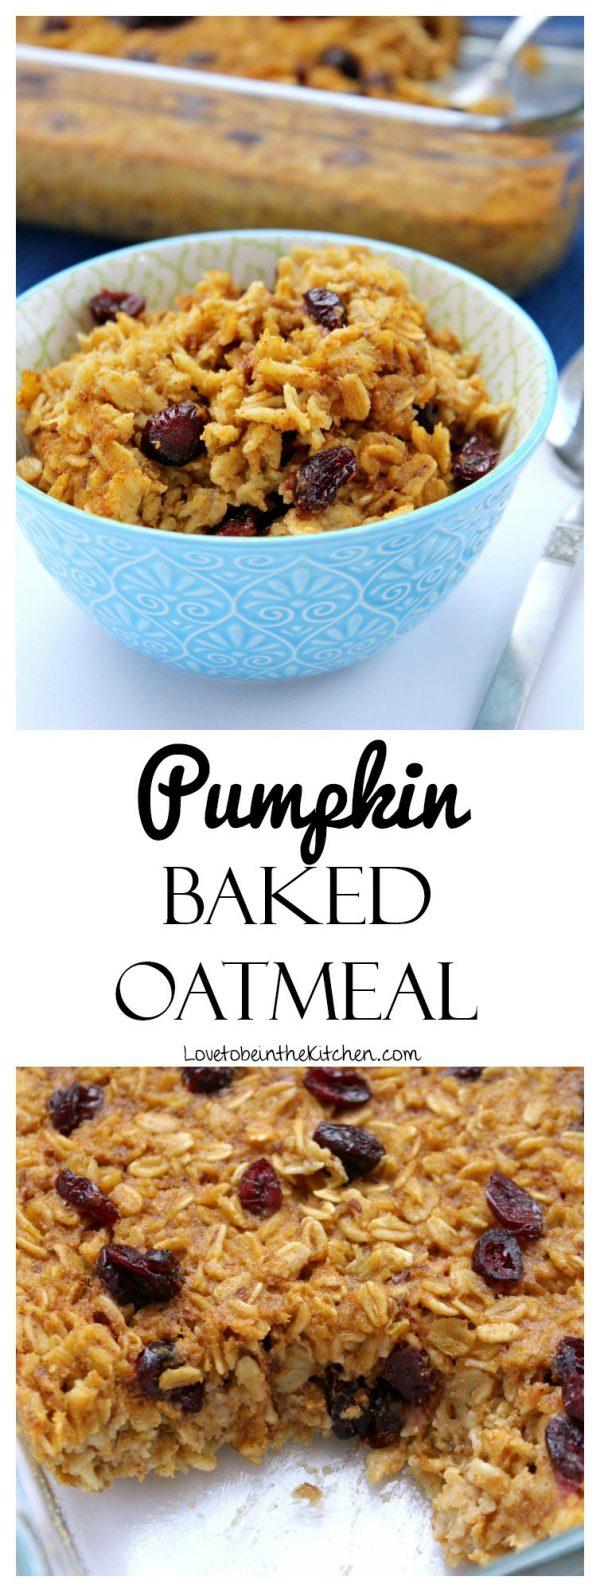 Pumpkin Baked Oatmeal